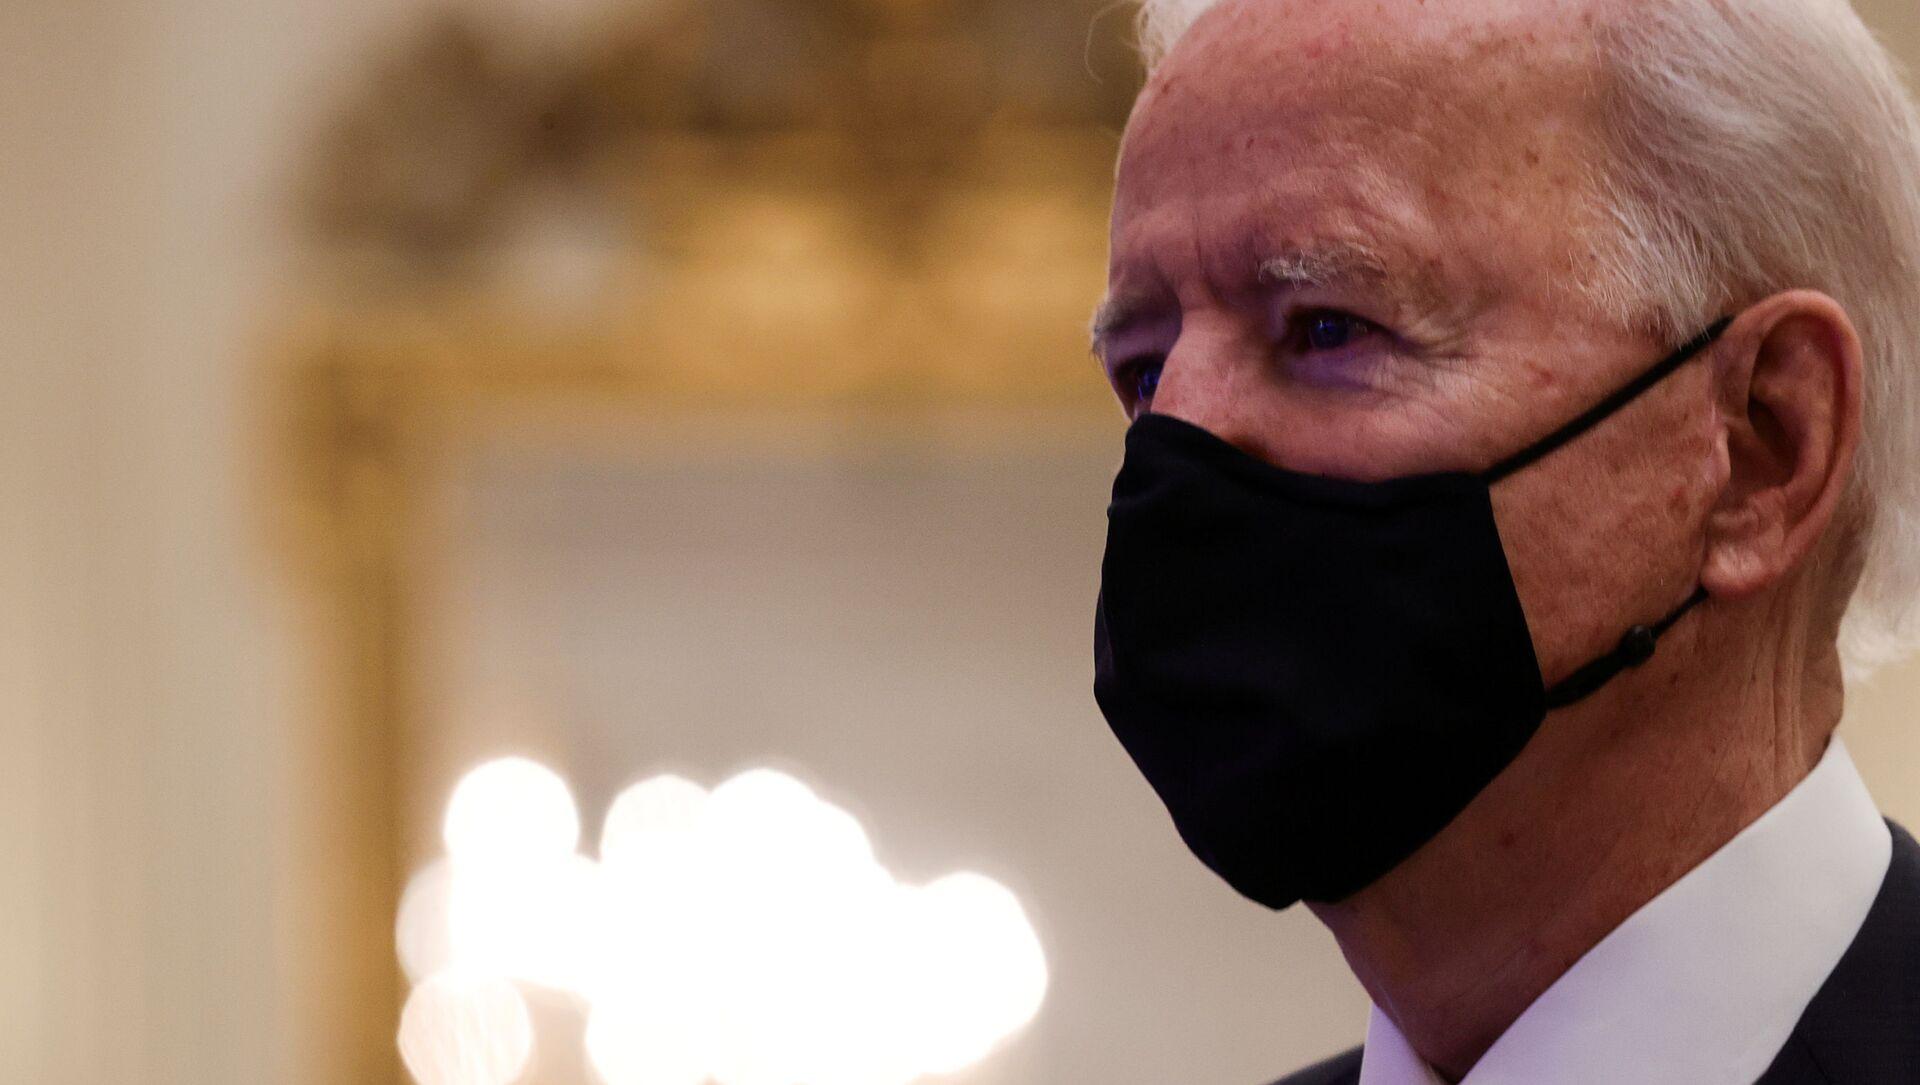 Joe Biden, presidente de EEUU - Sputnik Mundo, 1920, 04.02.2021